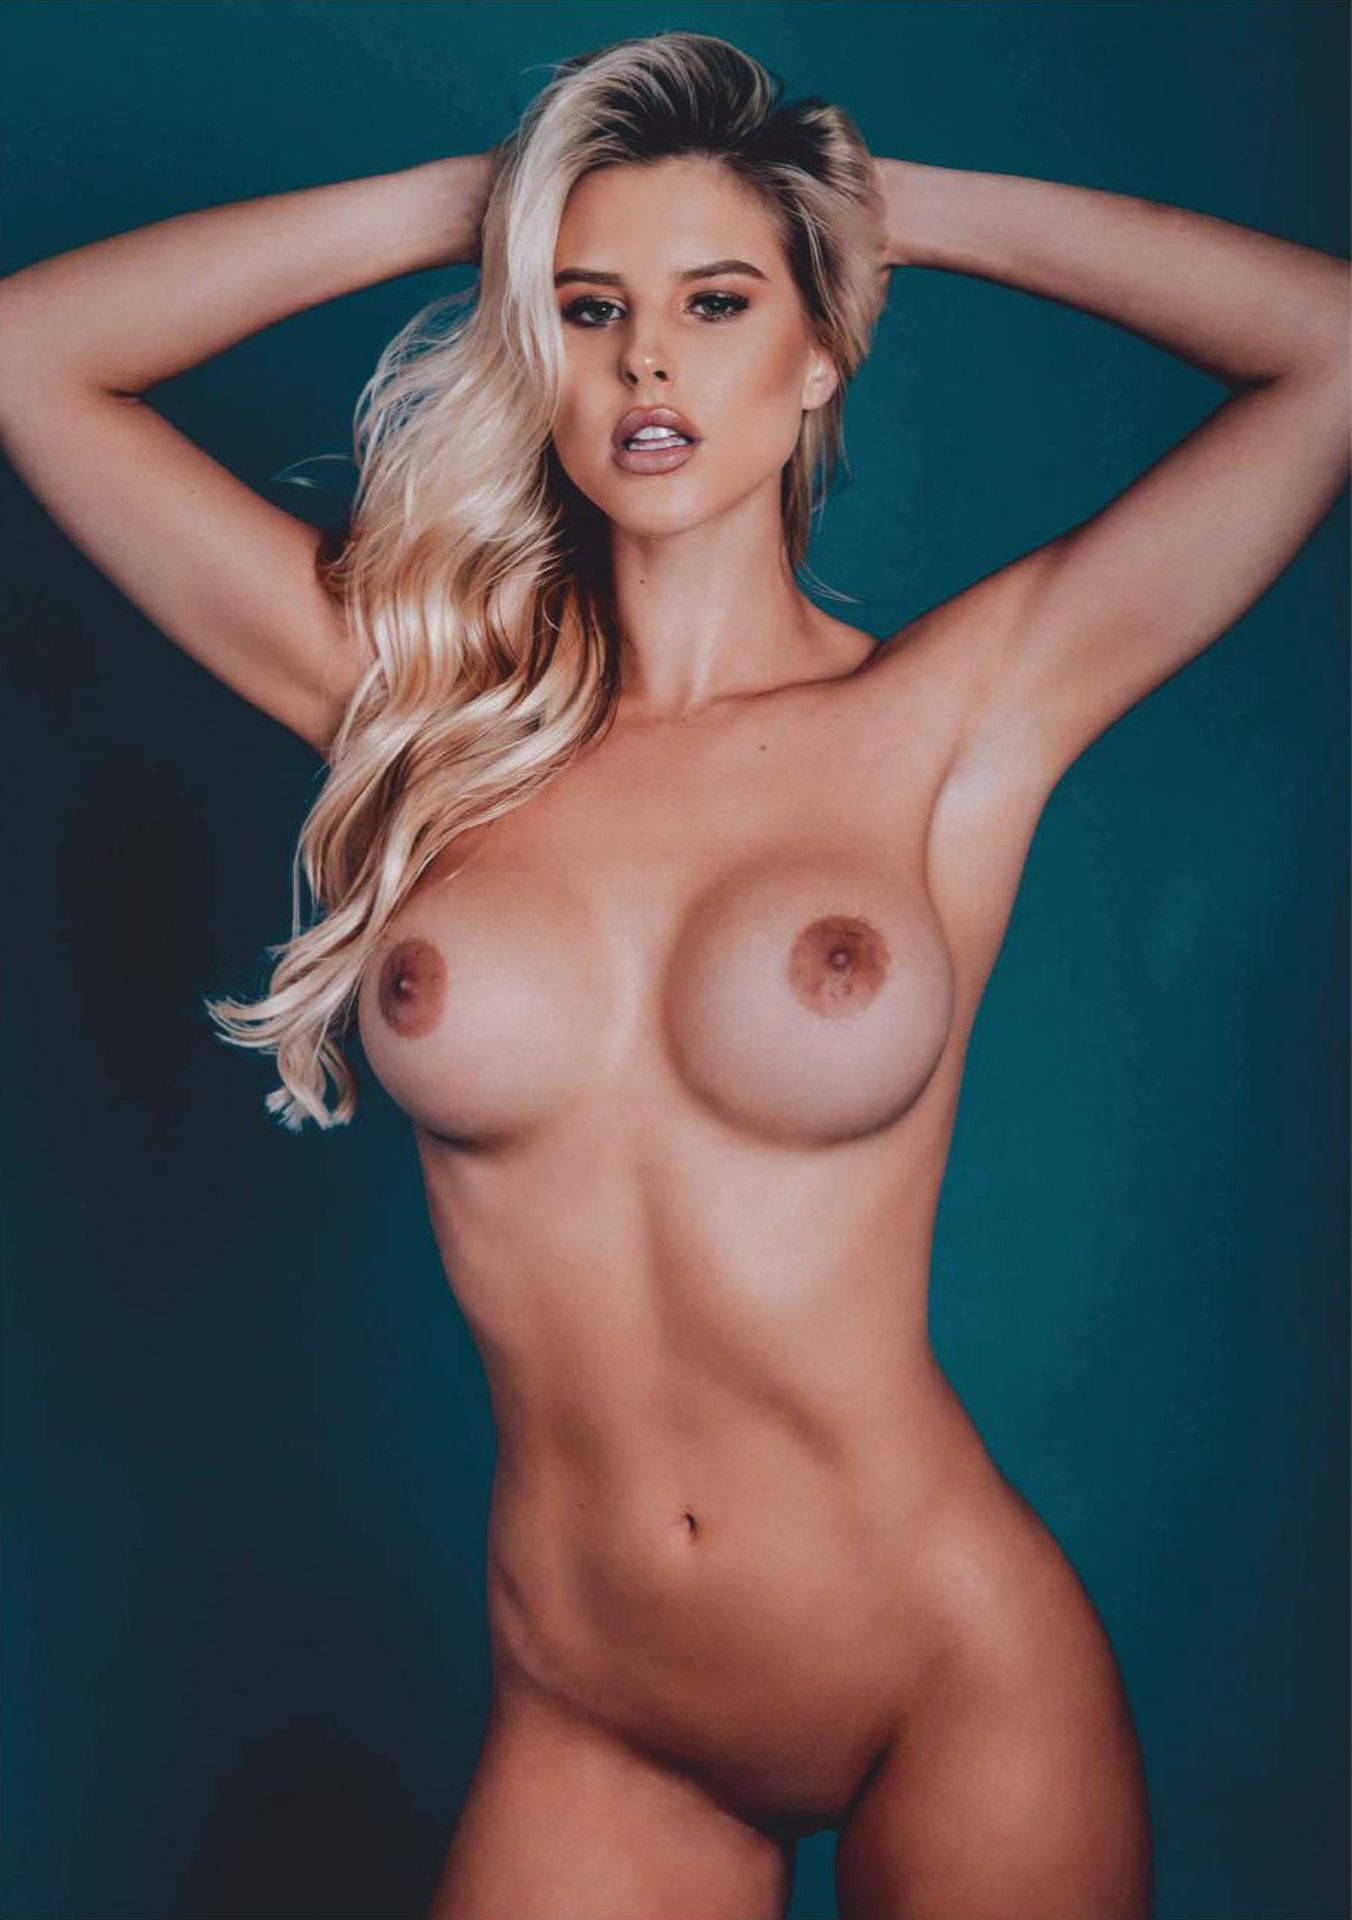 bondage hentai boobs bra